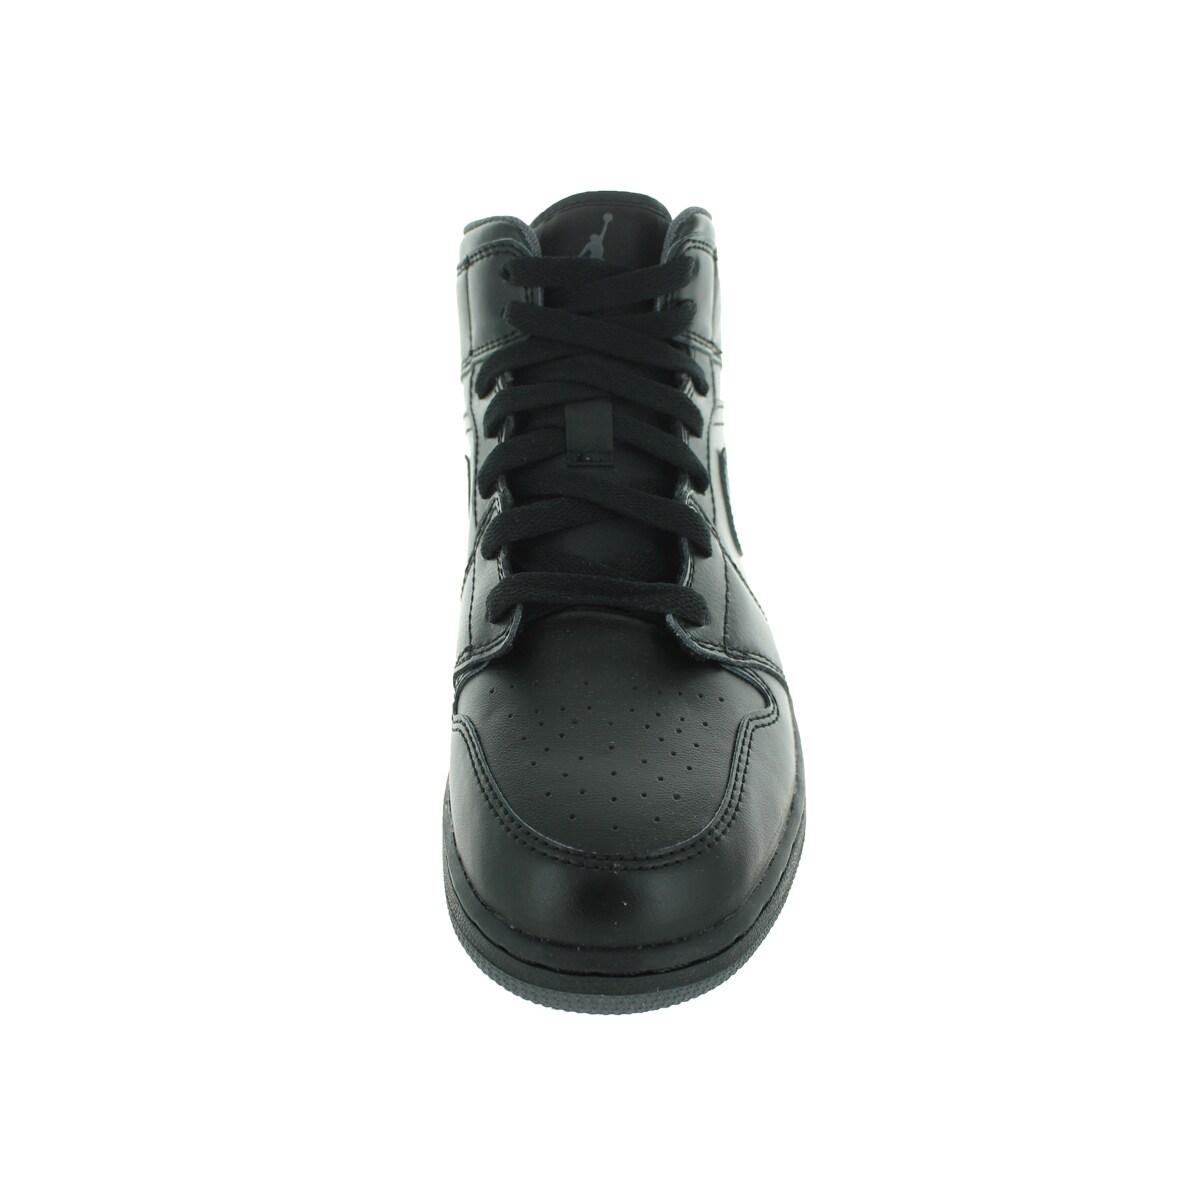 61409358a5b8 Shop Nike Jordan Kid s Air Jordan 1 Mid Bg Black Black Dark Grey Basketball  Shoe - Free Shipping Today - Overstock - 12321872